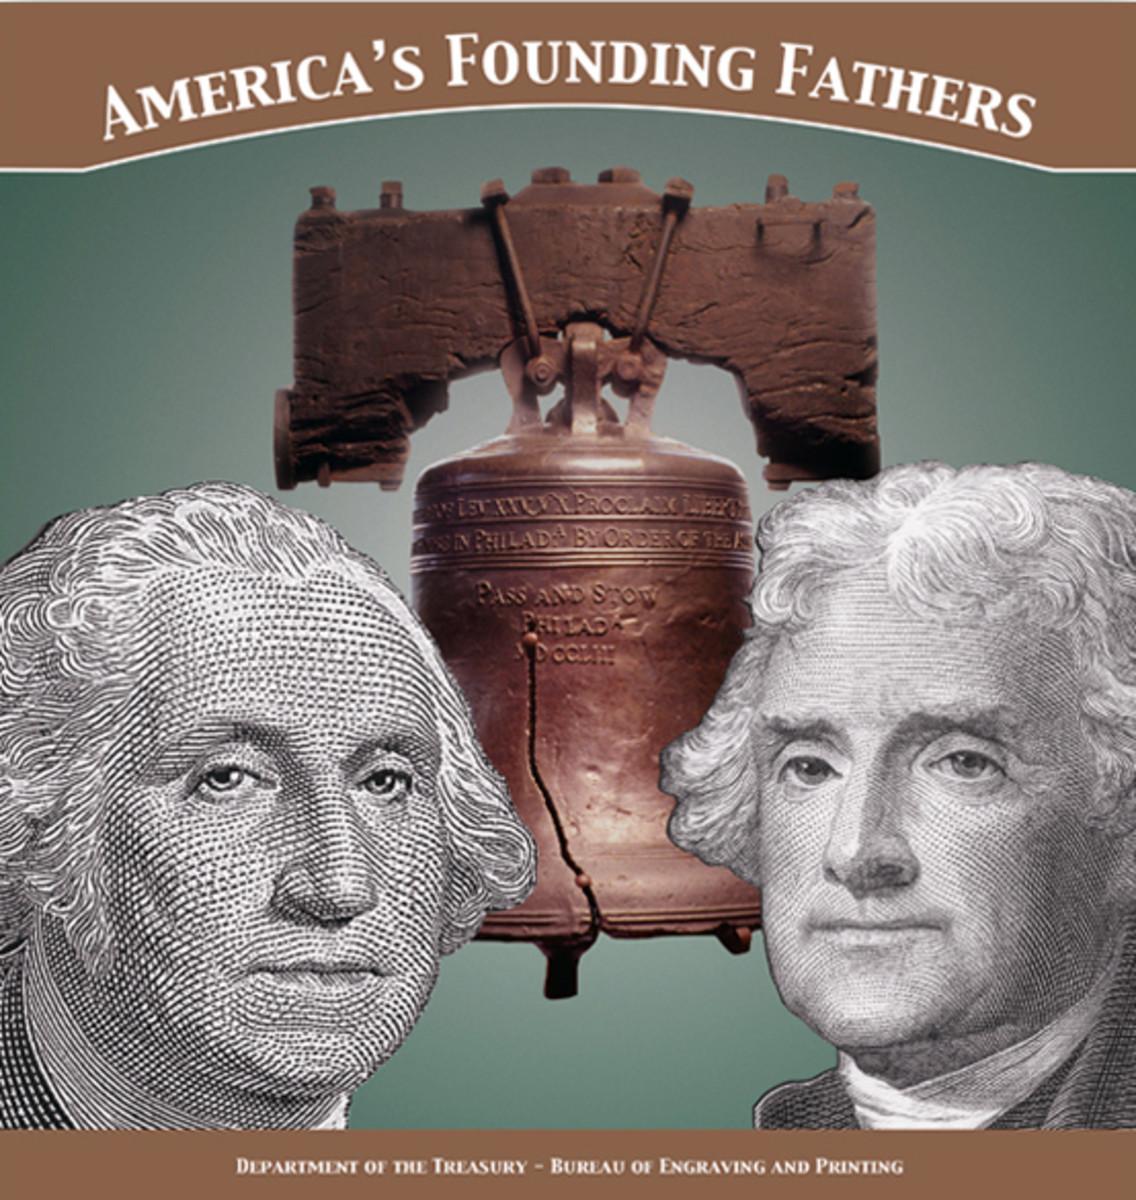 FoundingFathers A